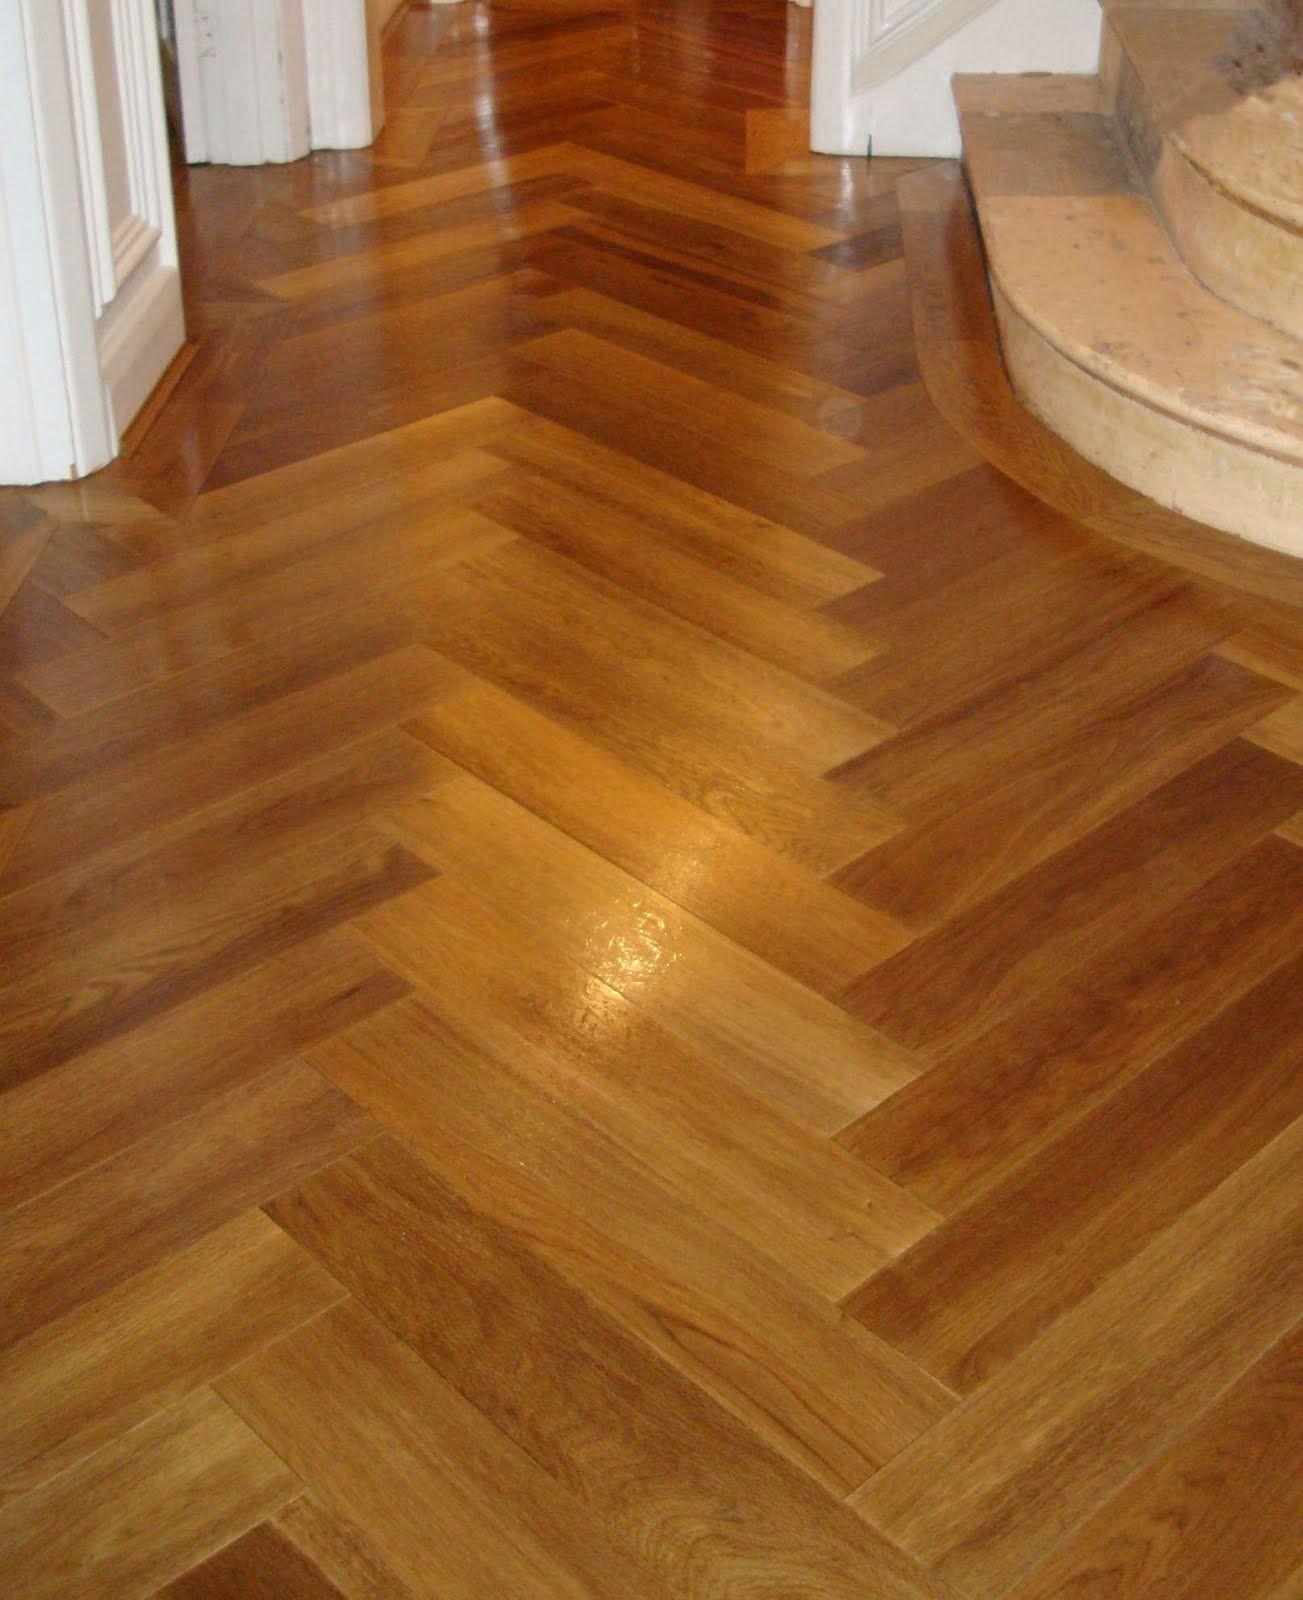 easy click engineered hardwood flooring of wood flooring ideas wood floorwood floor designwood floor design intended for wood flooring ideas wood floorwood floor designwood floor design ideas